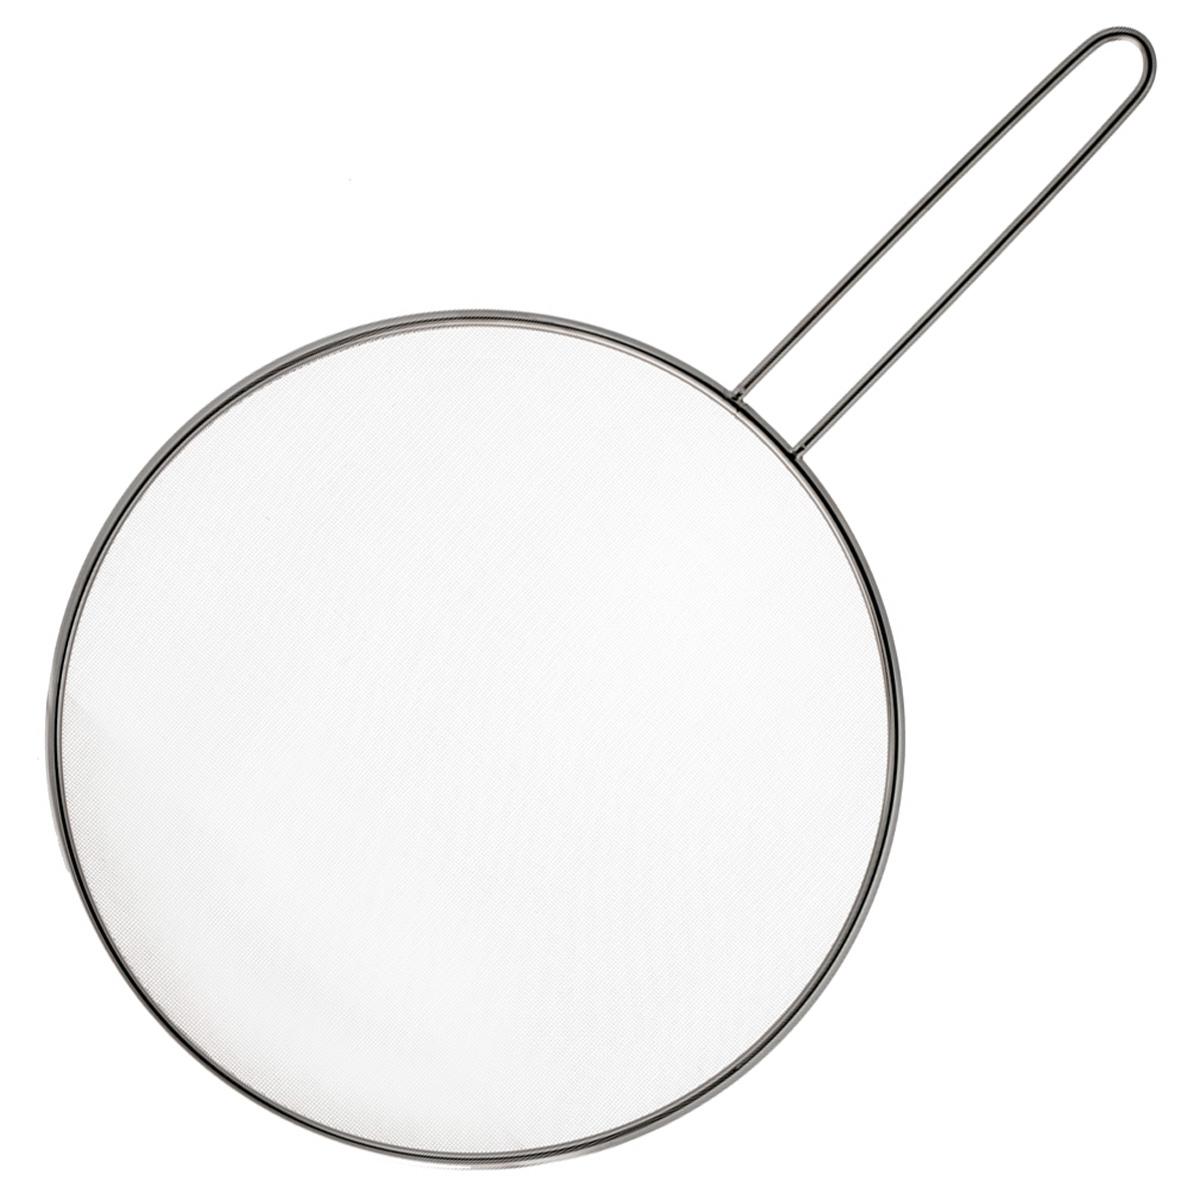 Сетка защитная Bekker, от брызг, диаметр 25 см